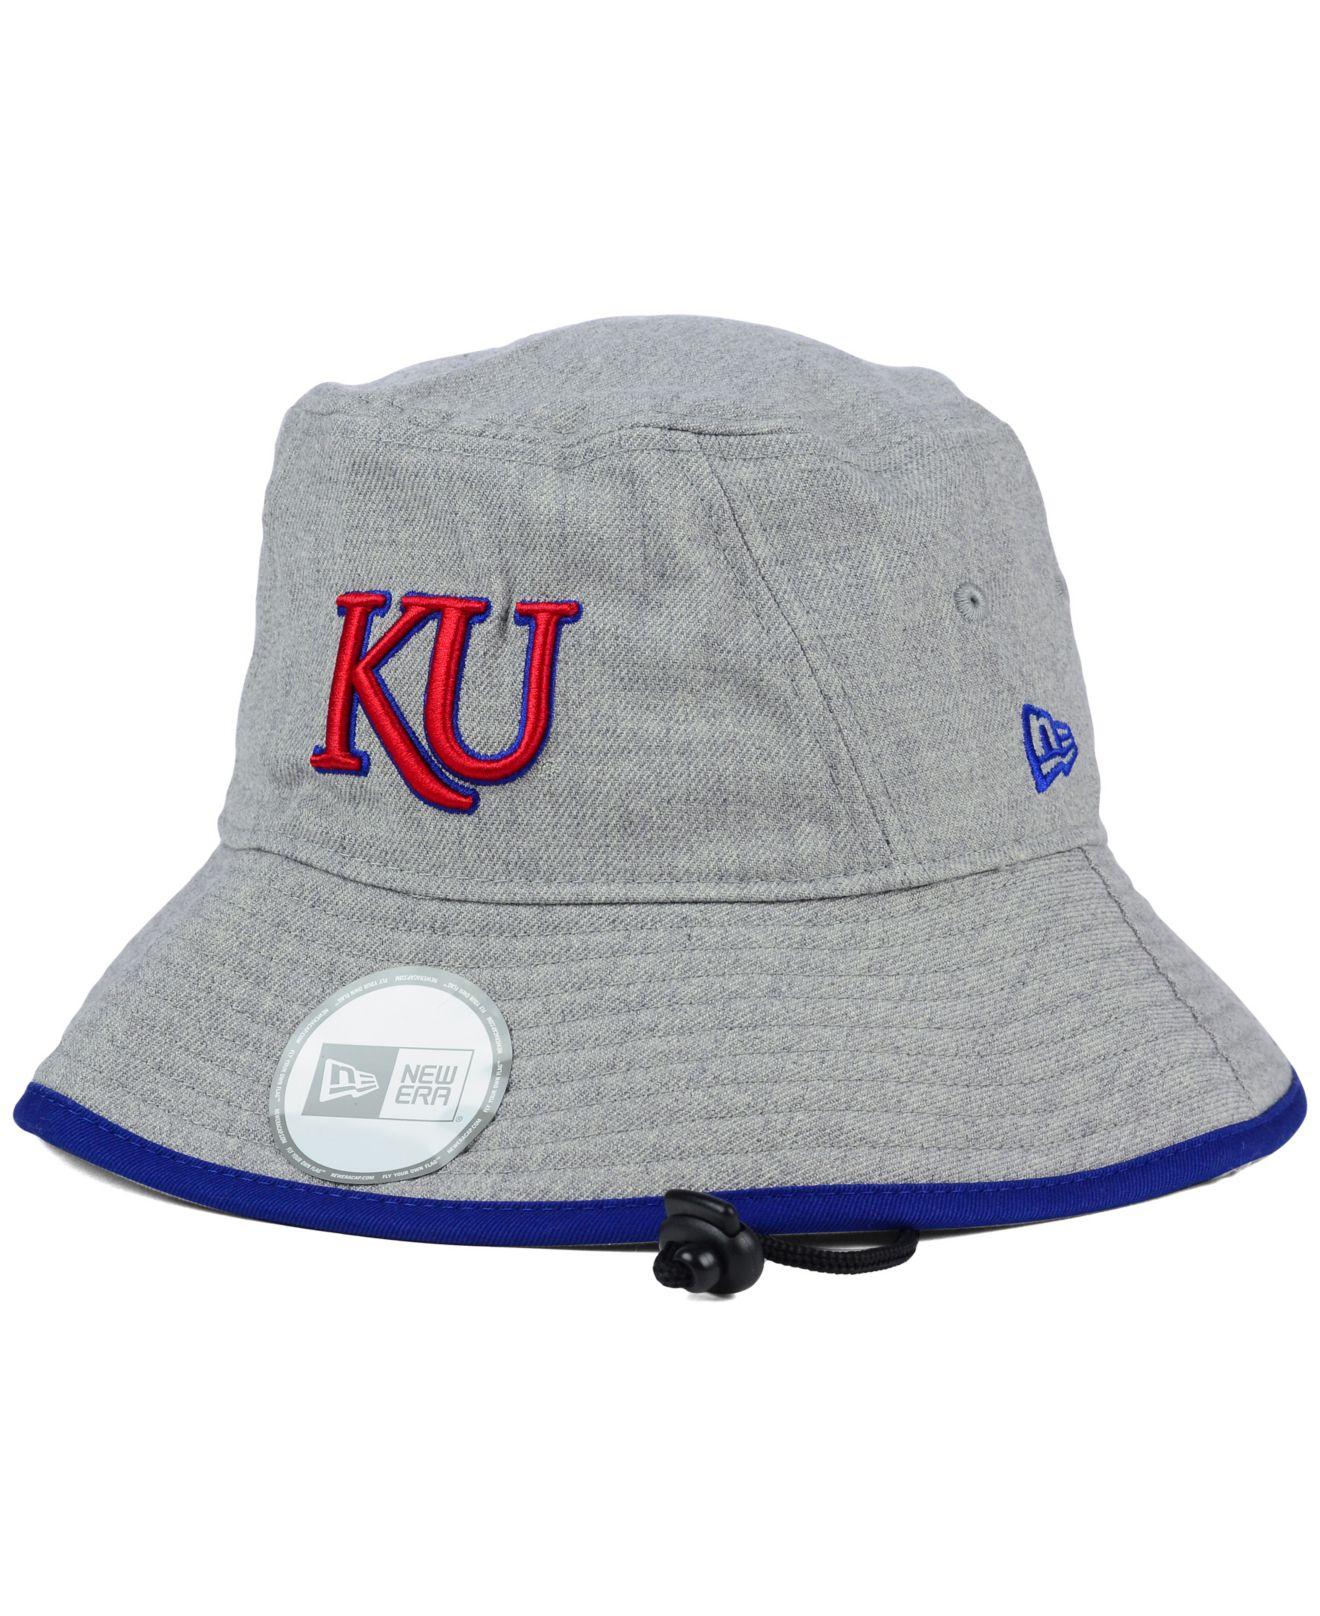 Lyst - KTZ Kansas Jayhawks Tip Bucket Hat in Gray f0e0680243f